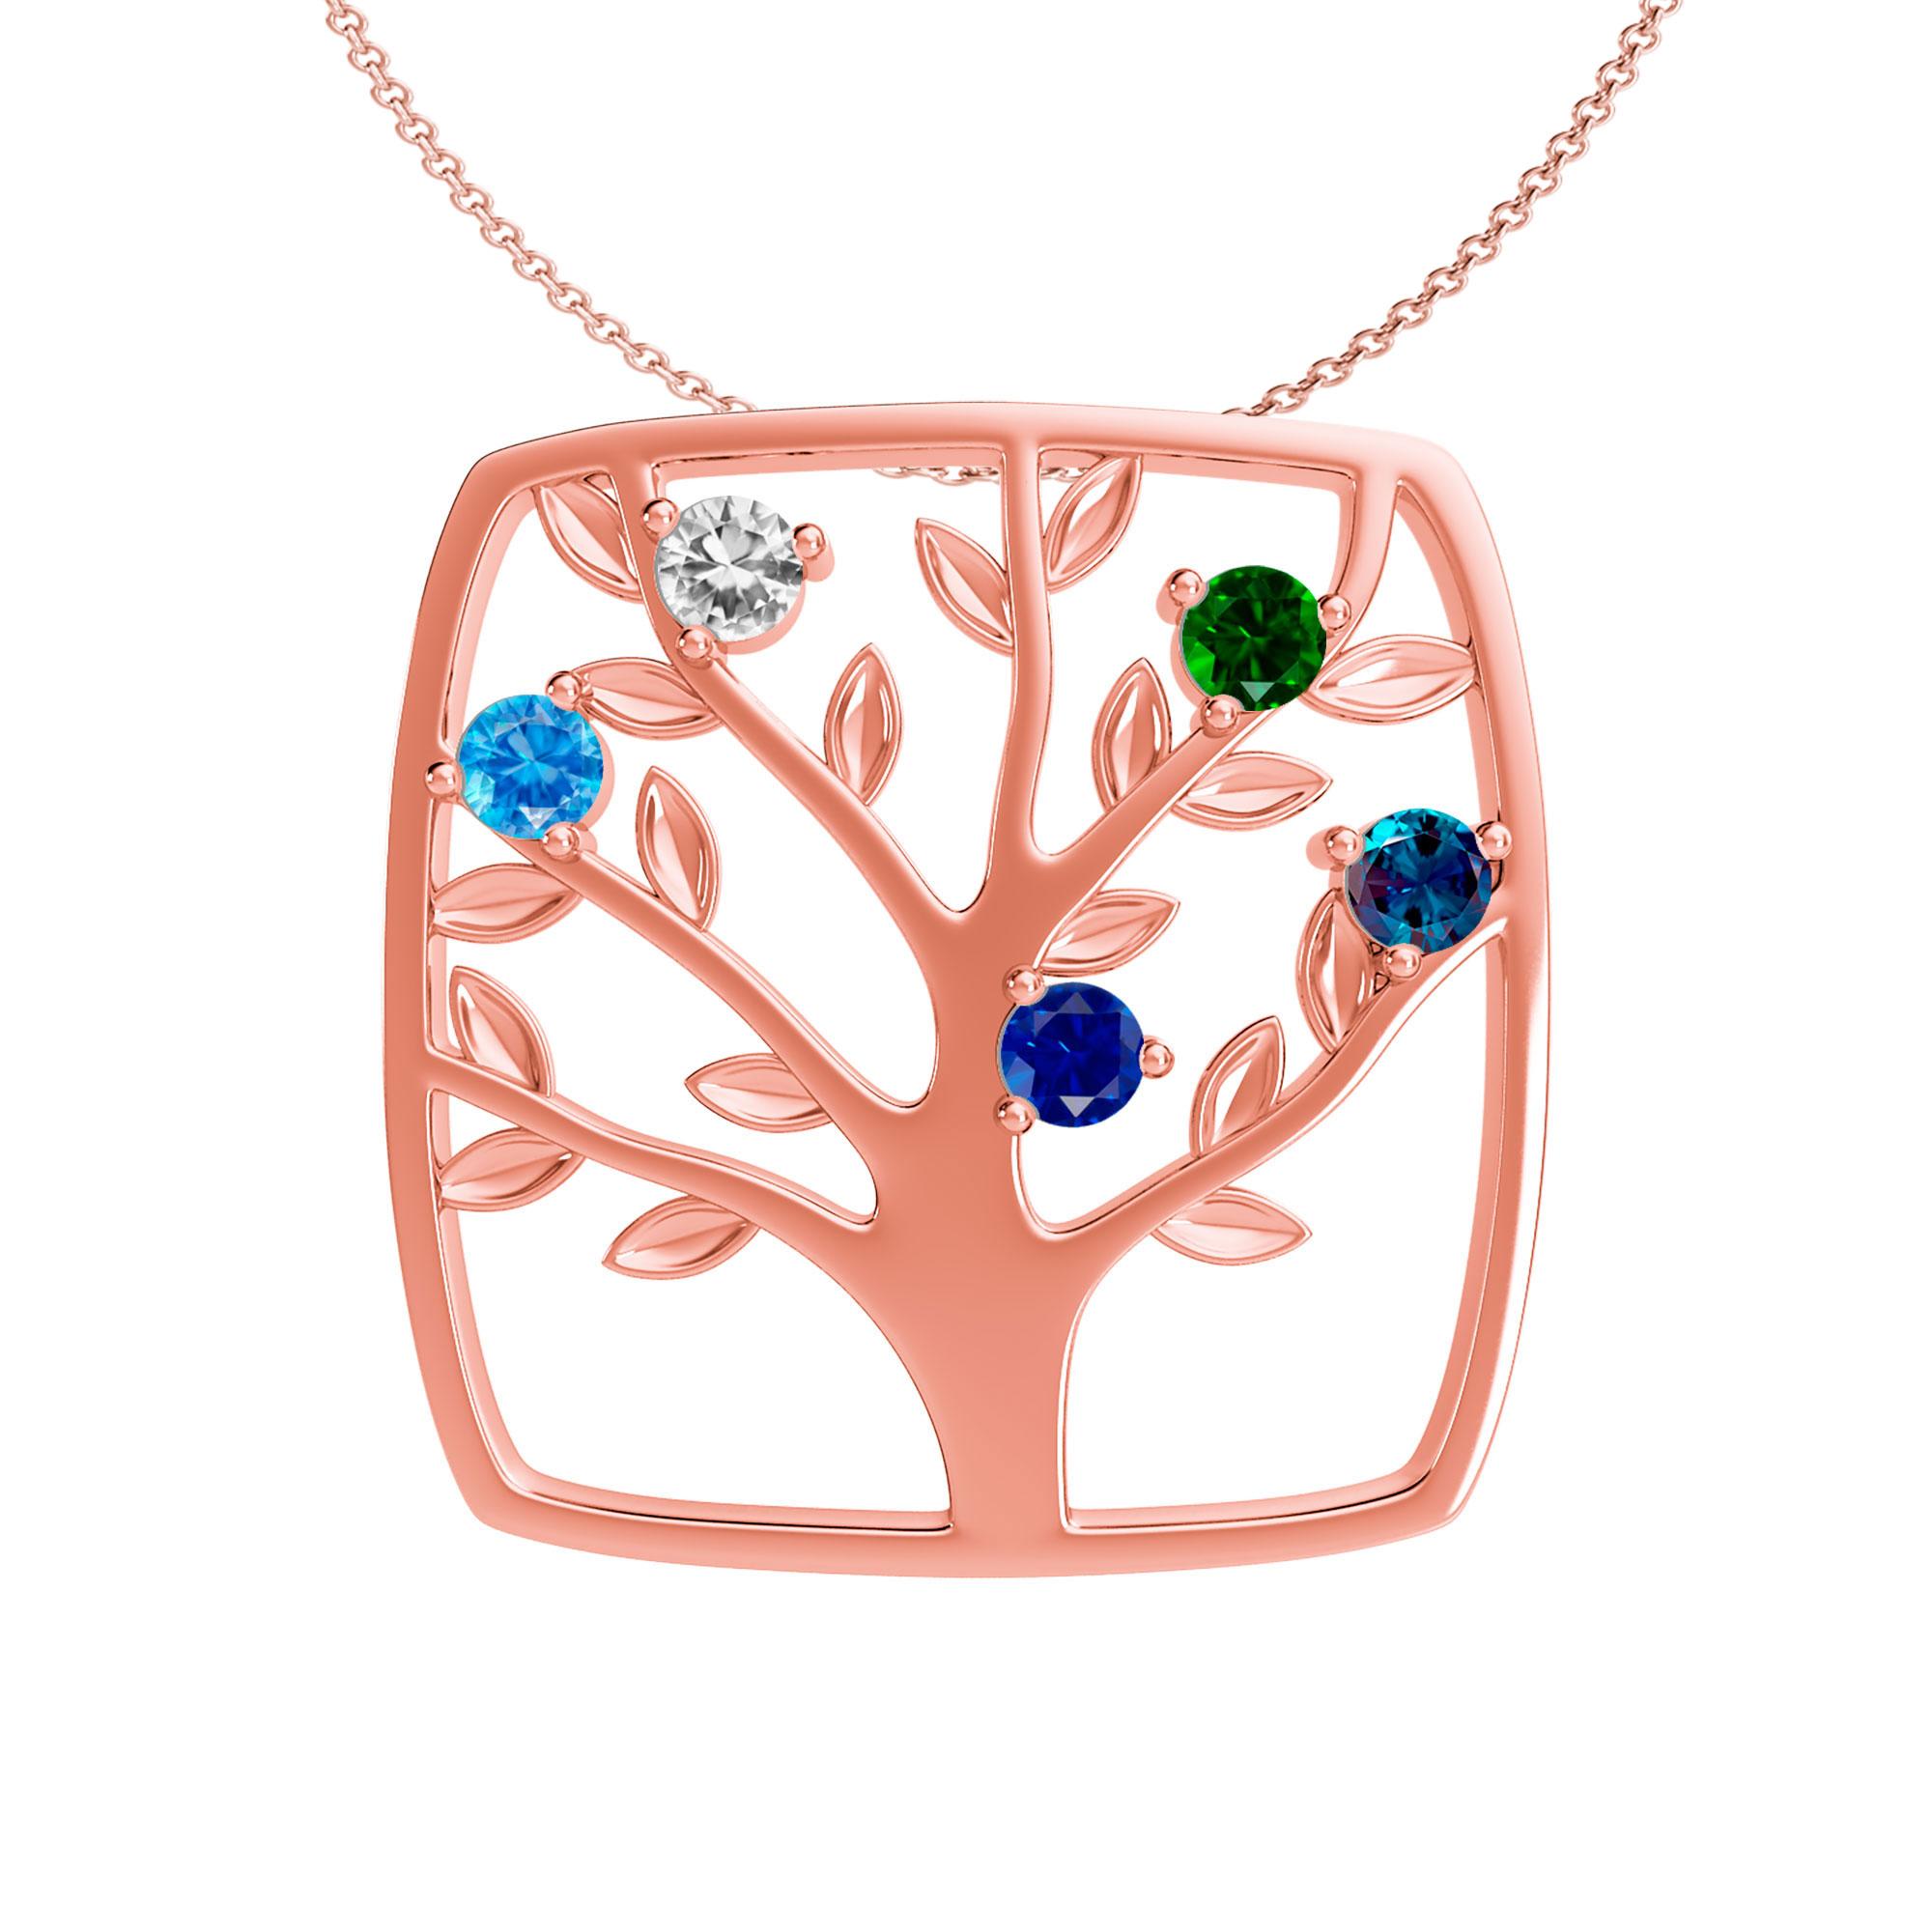 Mother's Family Tree Custom Birthstone Pendant Necklace (2-5 Gemstones)